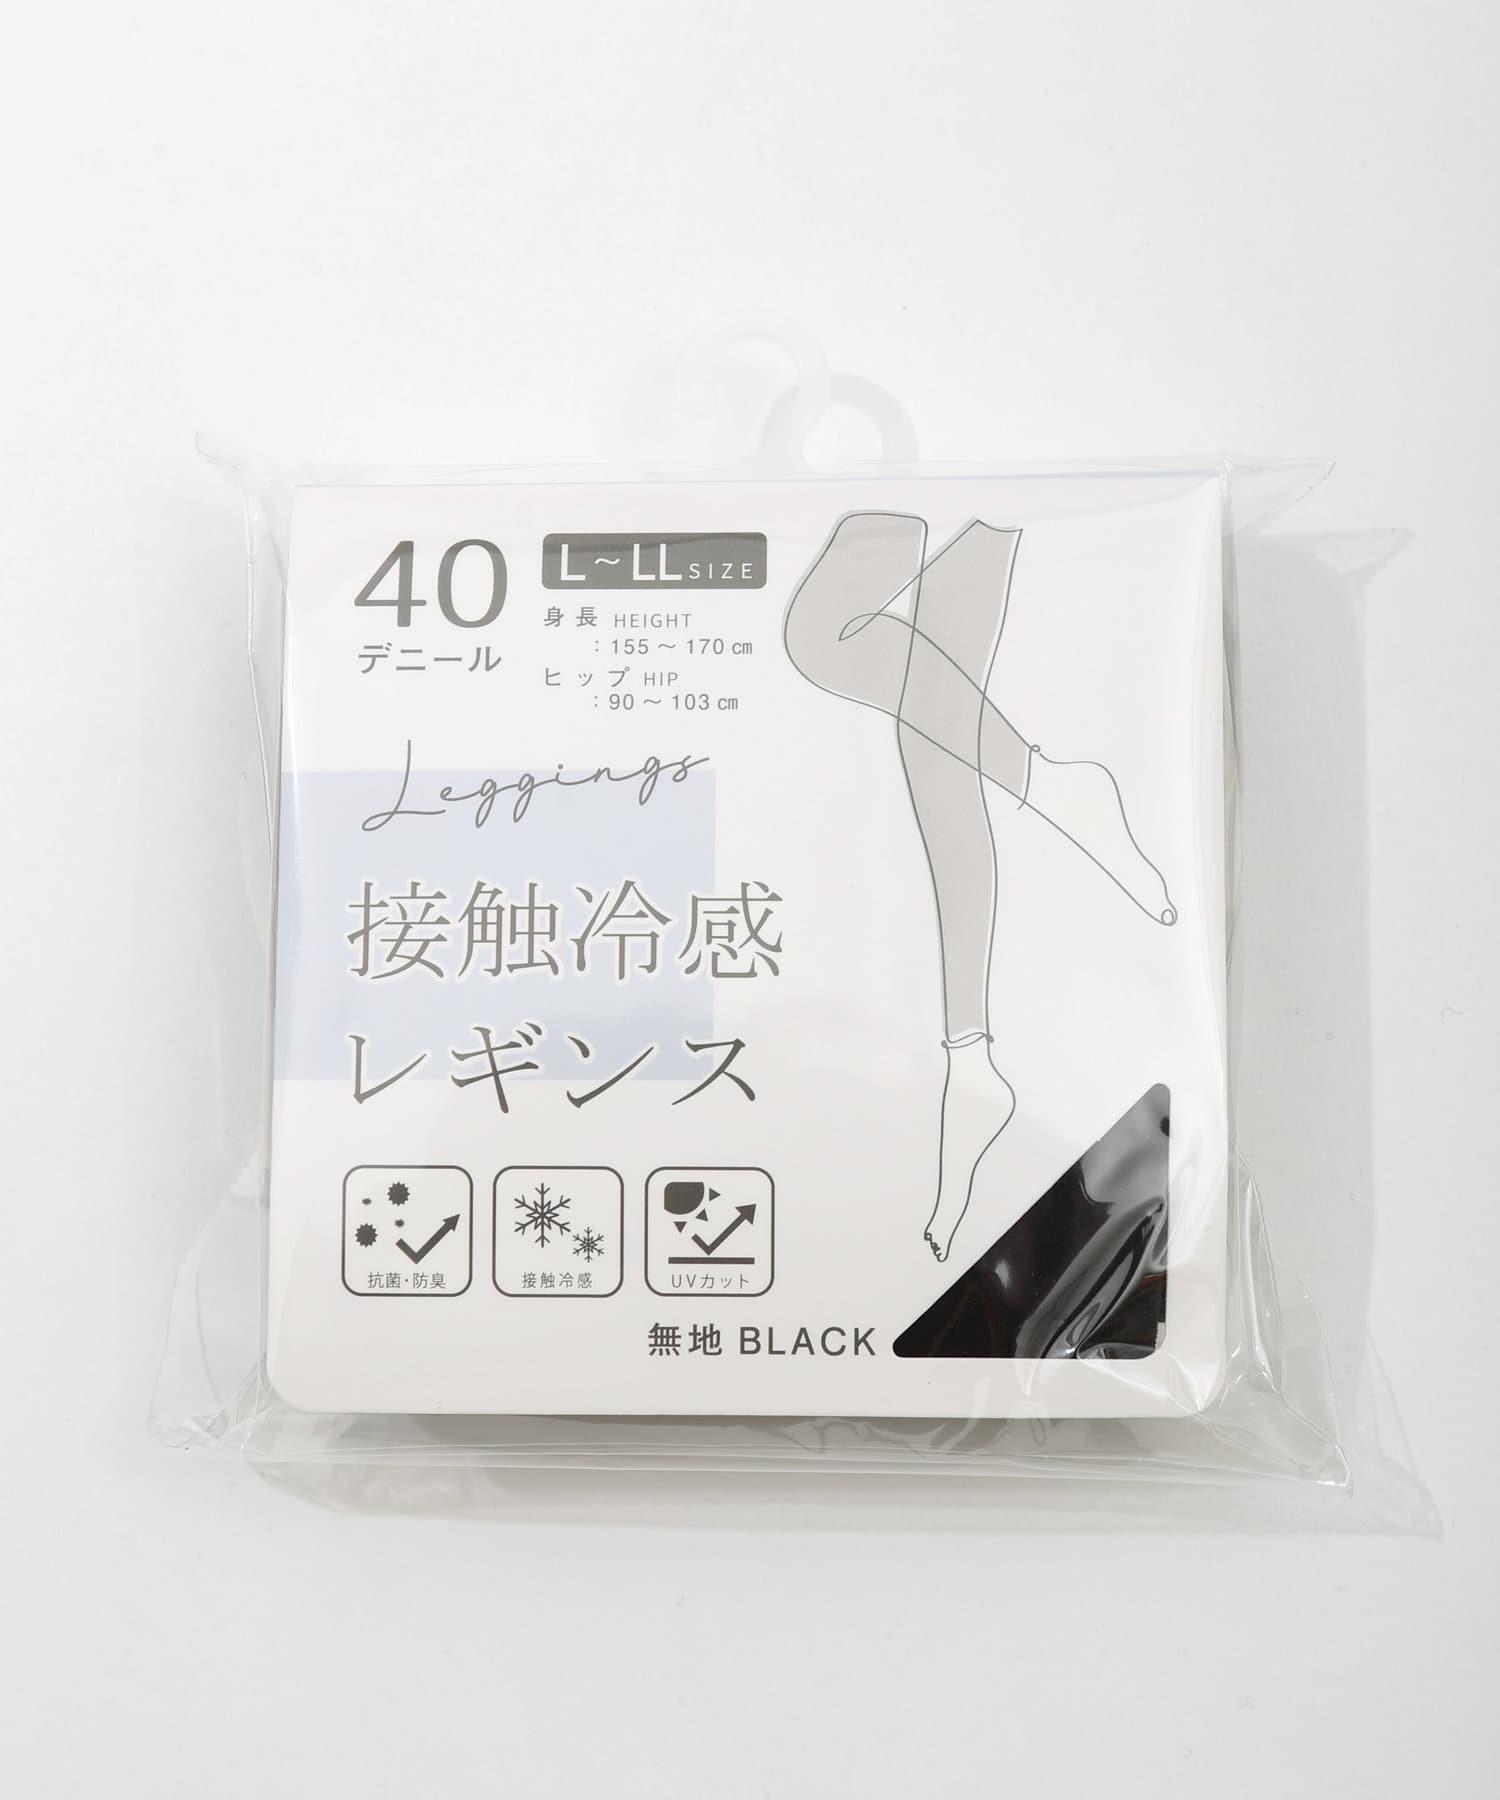 3COINS(スリーコインズ) ライフスタイル 【春夏快適インナー】接触冷感レギンスL ブラック